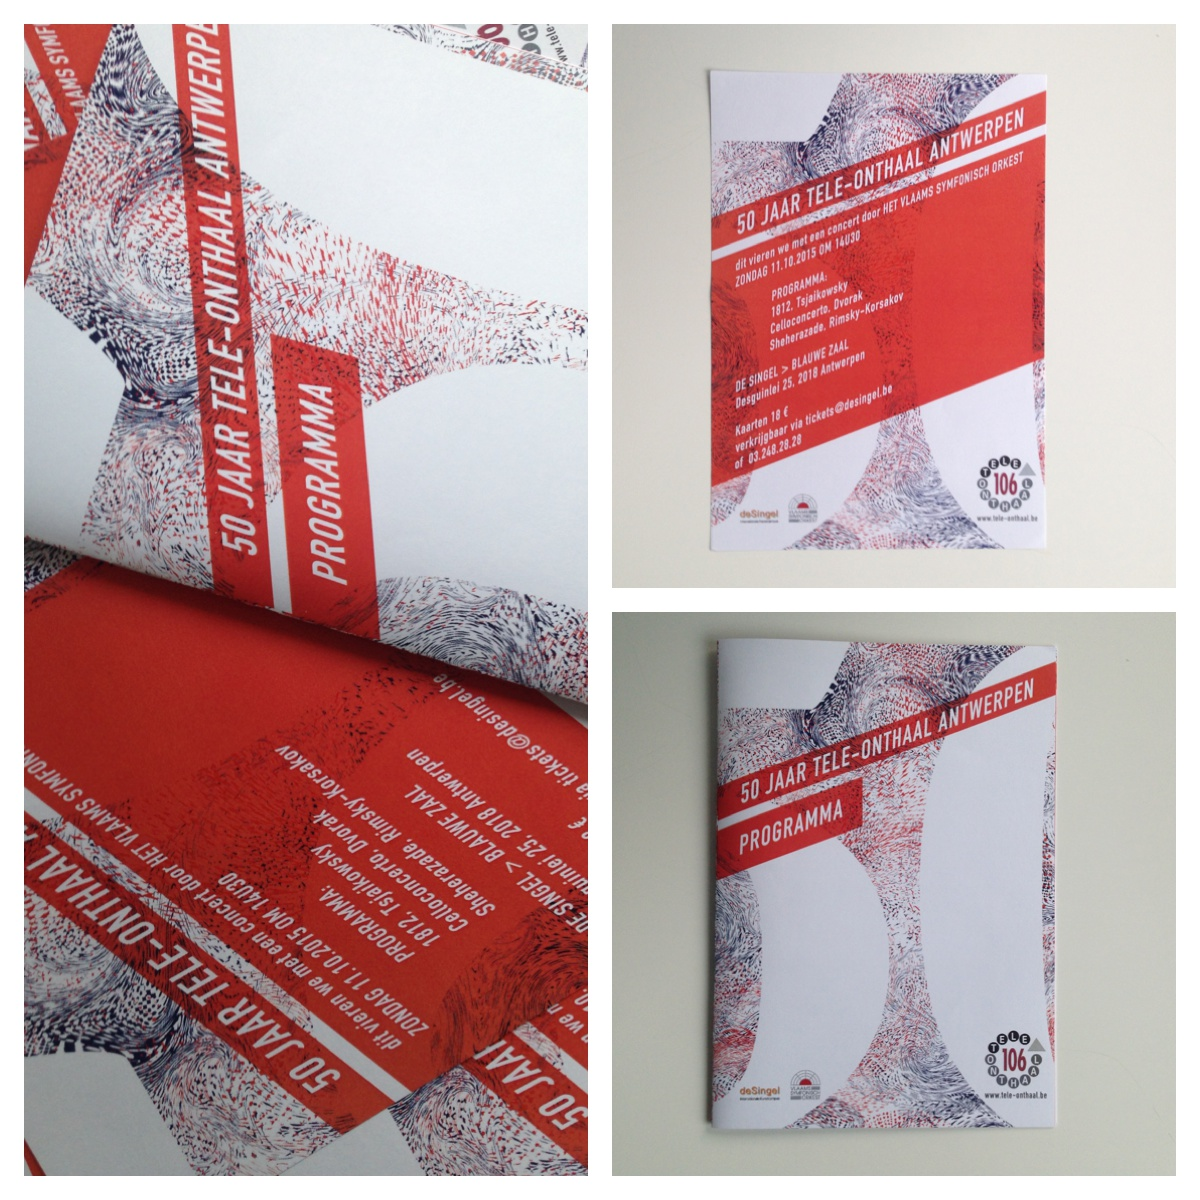 drukwerk poster flyer tele-onthaal